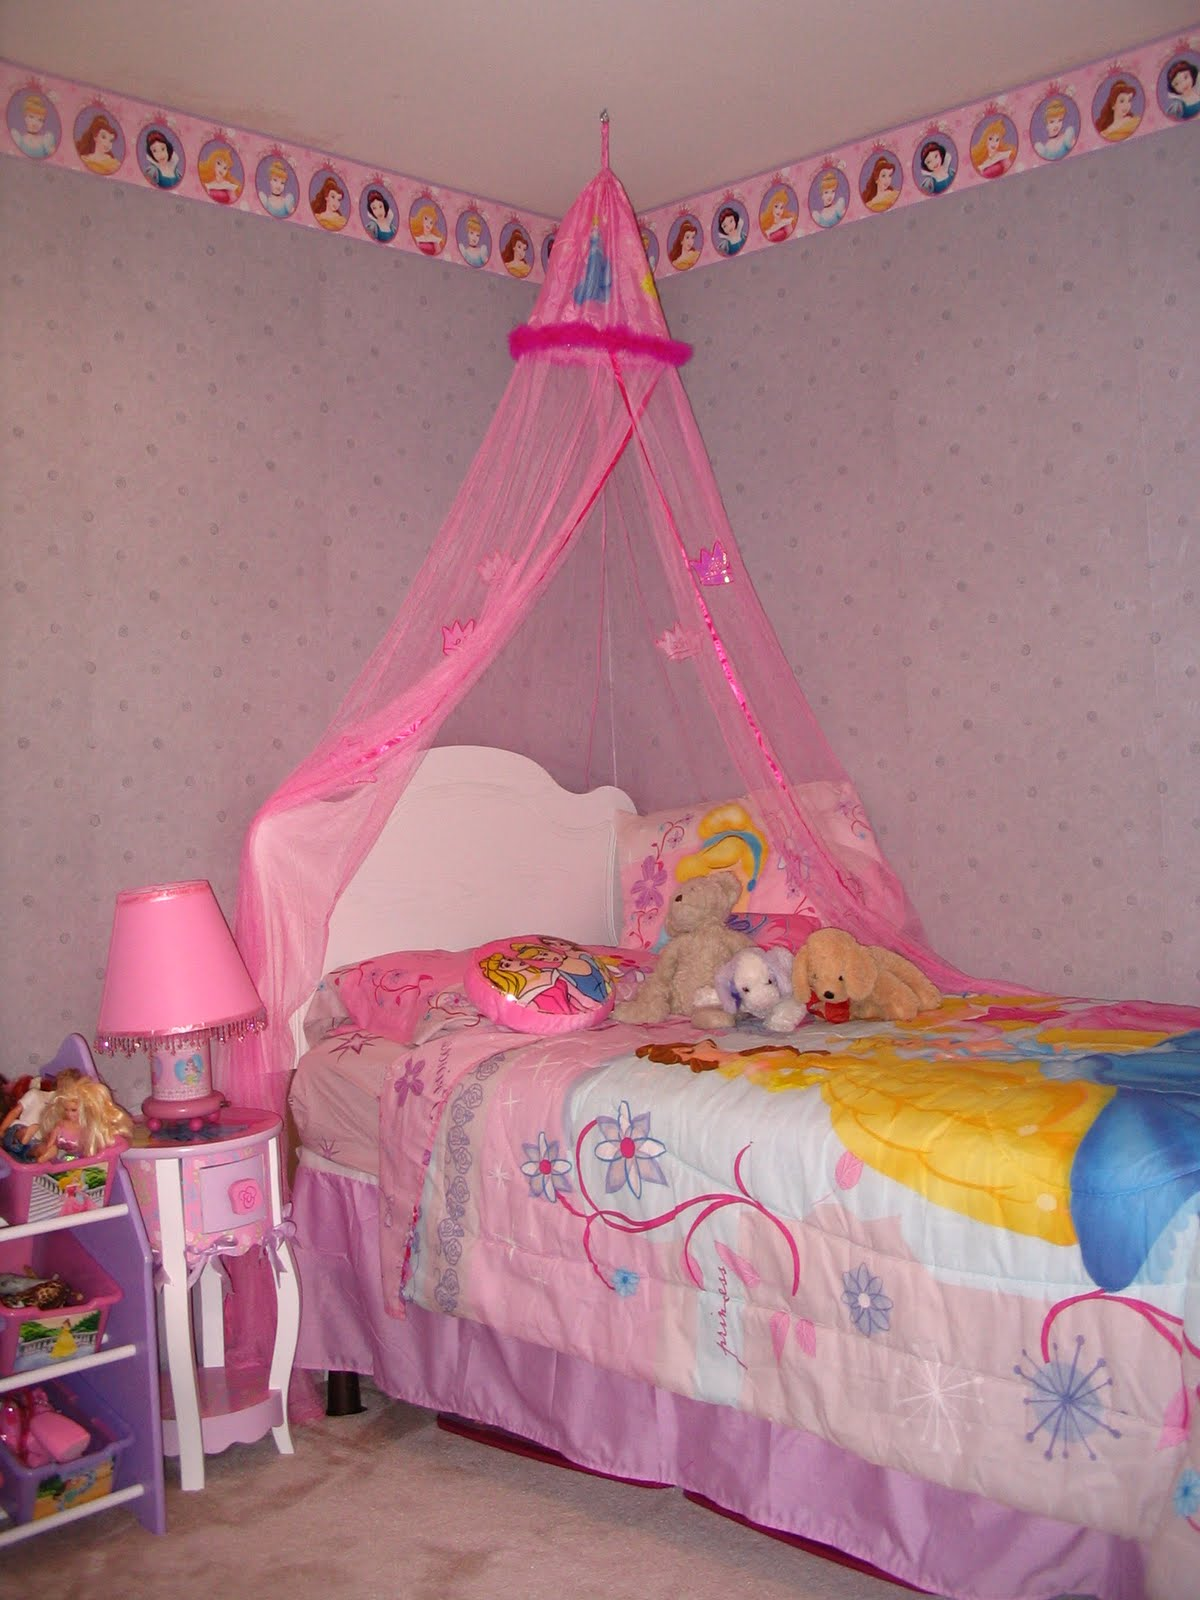 Kids Bedroom For Sale For Sale Disney Princess Bed Canopy